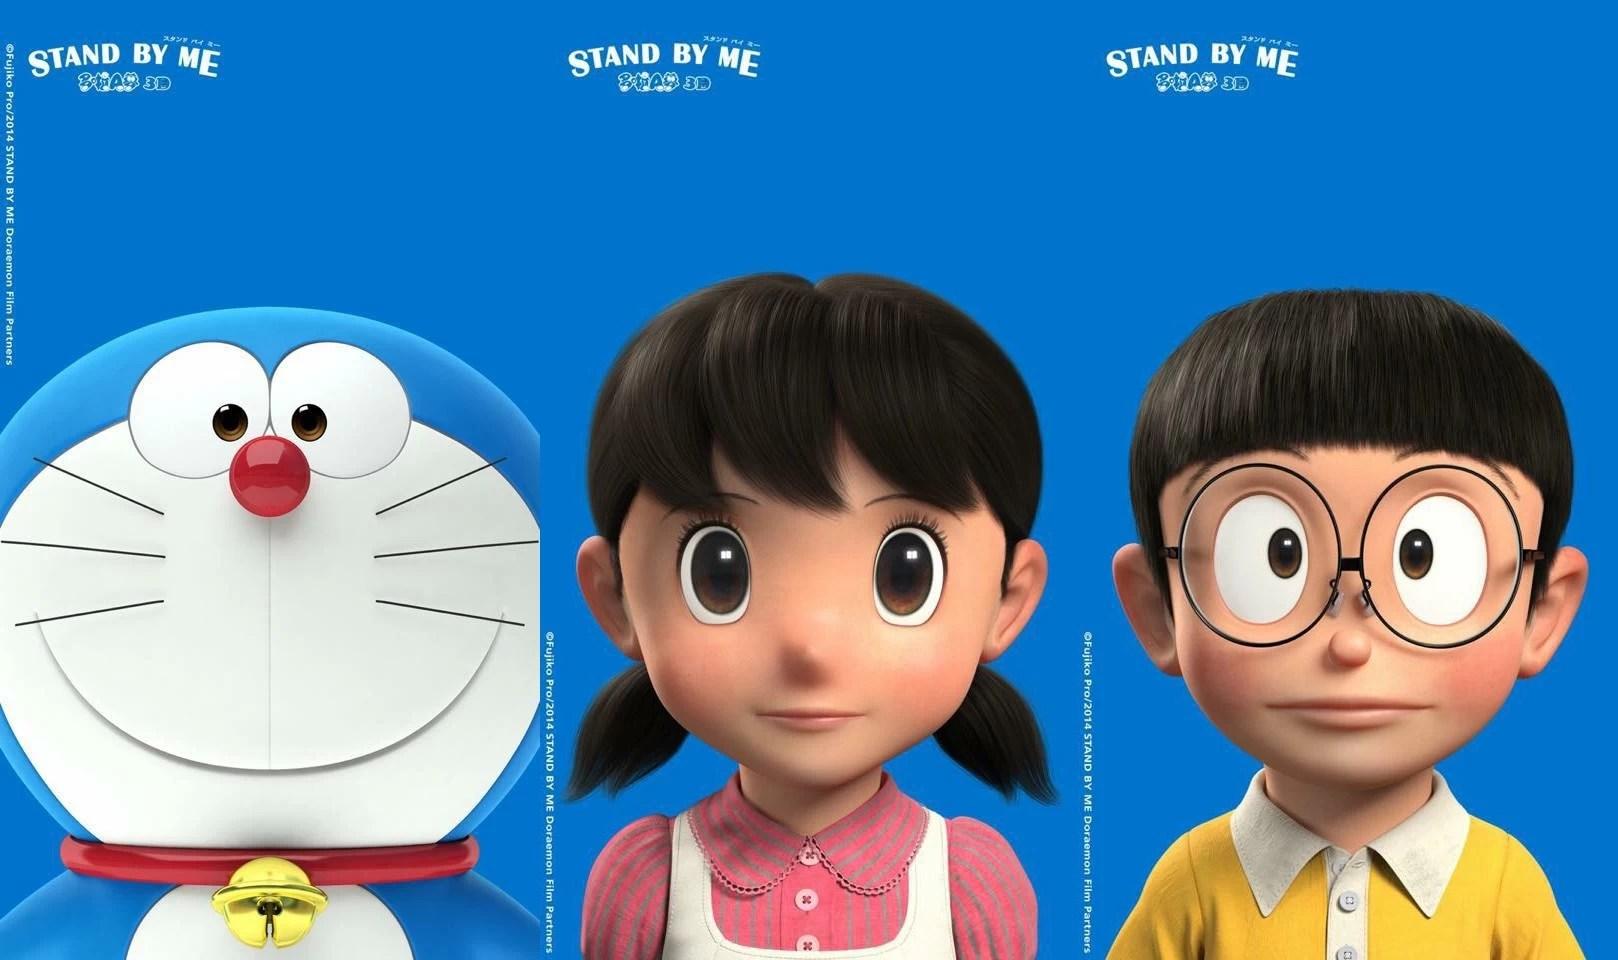 Nobita 3d Wallpaper แจก Wallpaper สุดสวย Stand By Me Doraemon โดราเอมอน